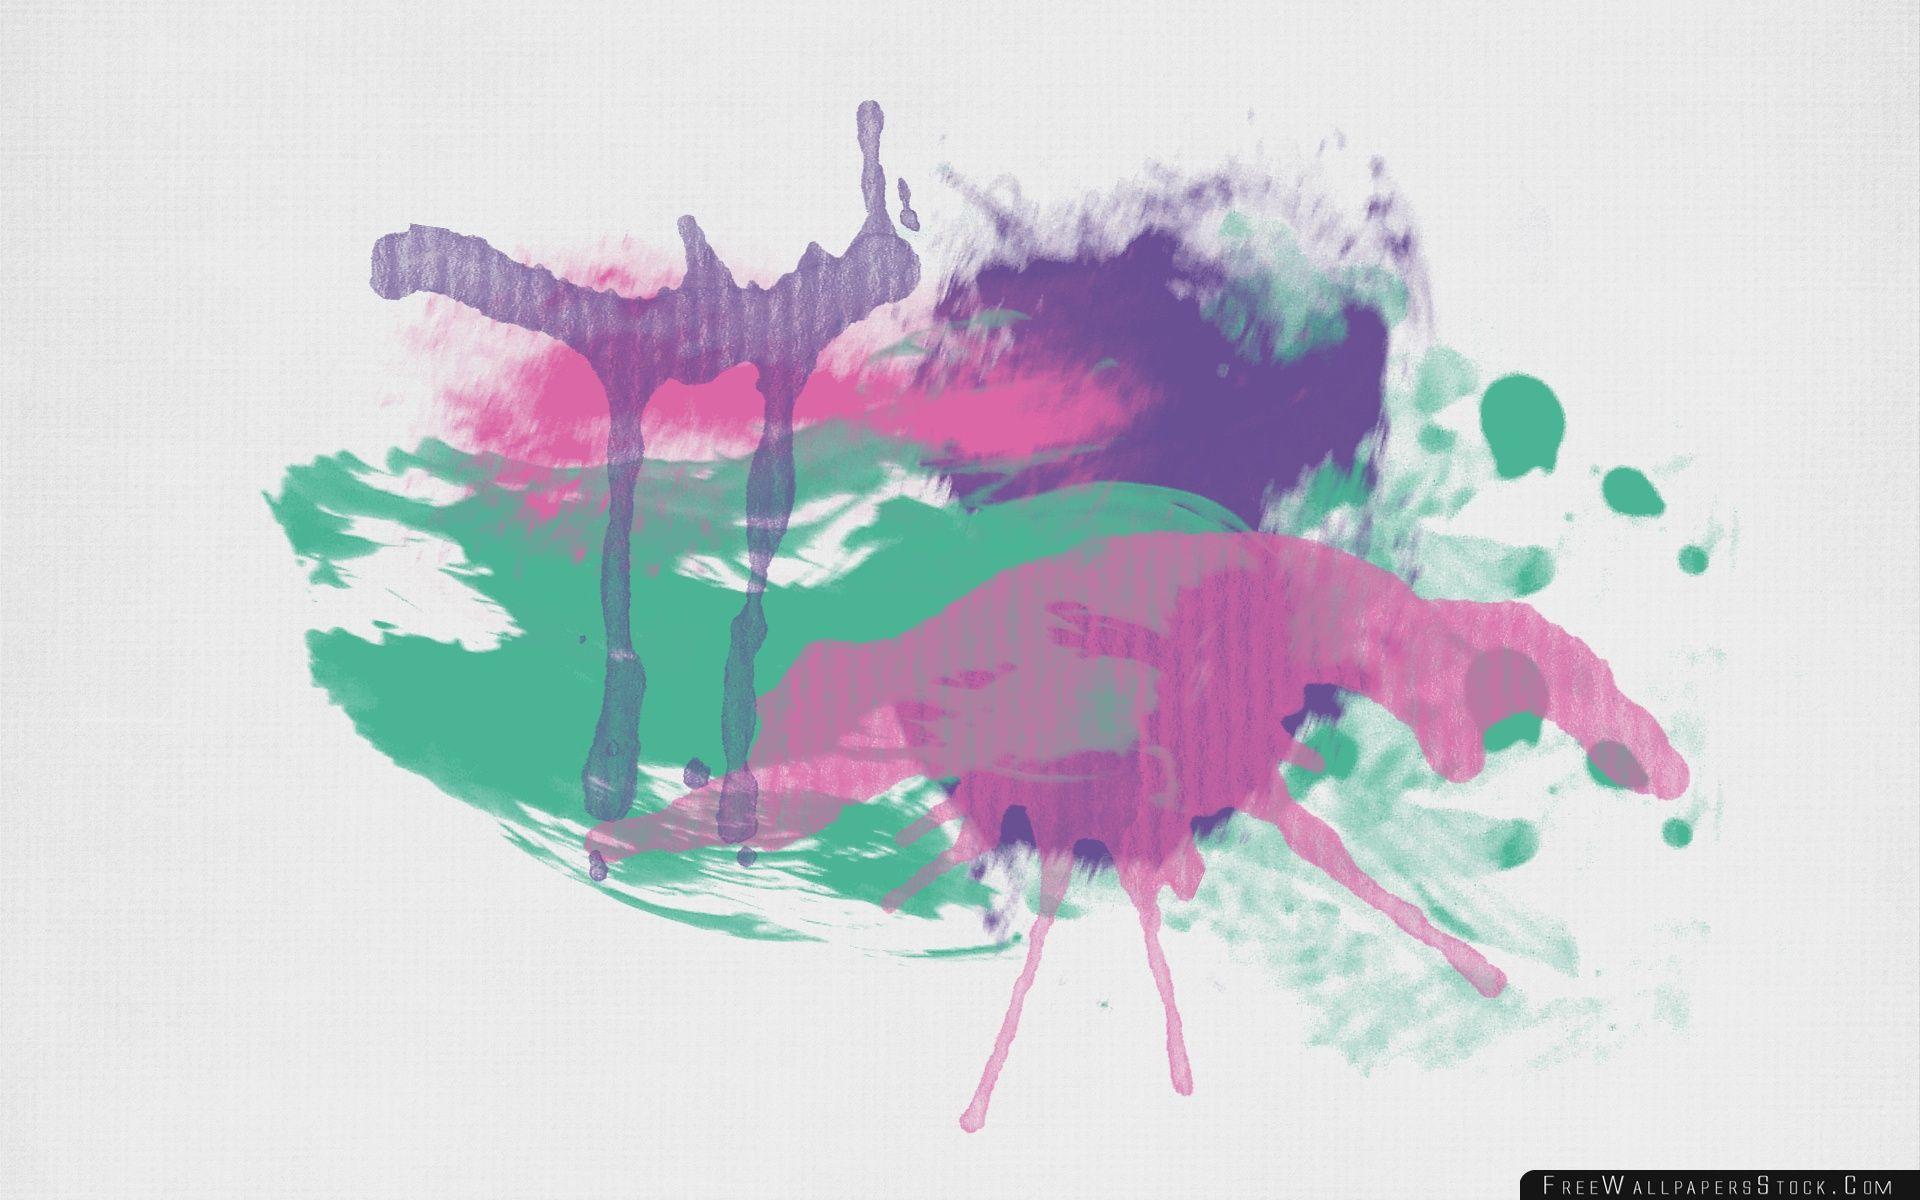 Download Free Wallpaper Paint Splatters